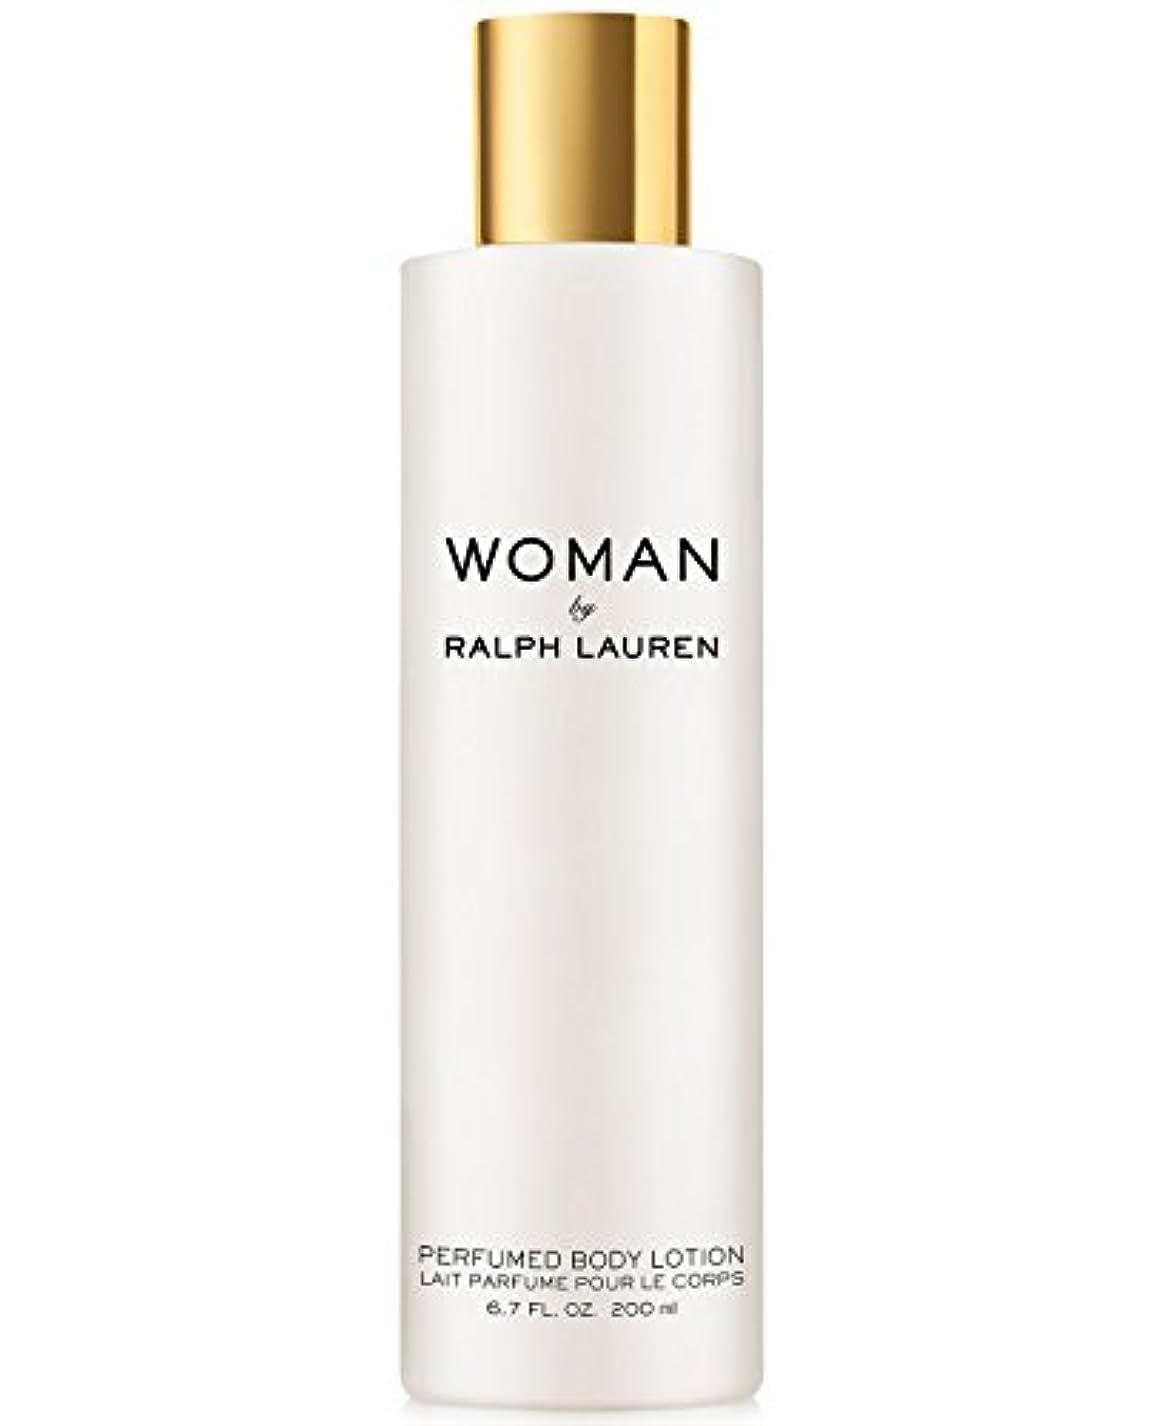 Woman (ウーマン) 6.7 oz (200ml) Perfumed Body Lotion(ラルフ ローレン)